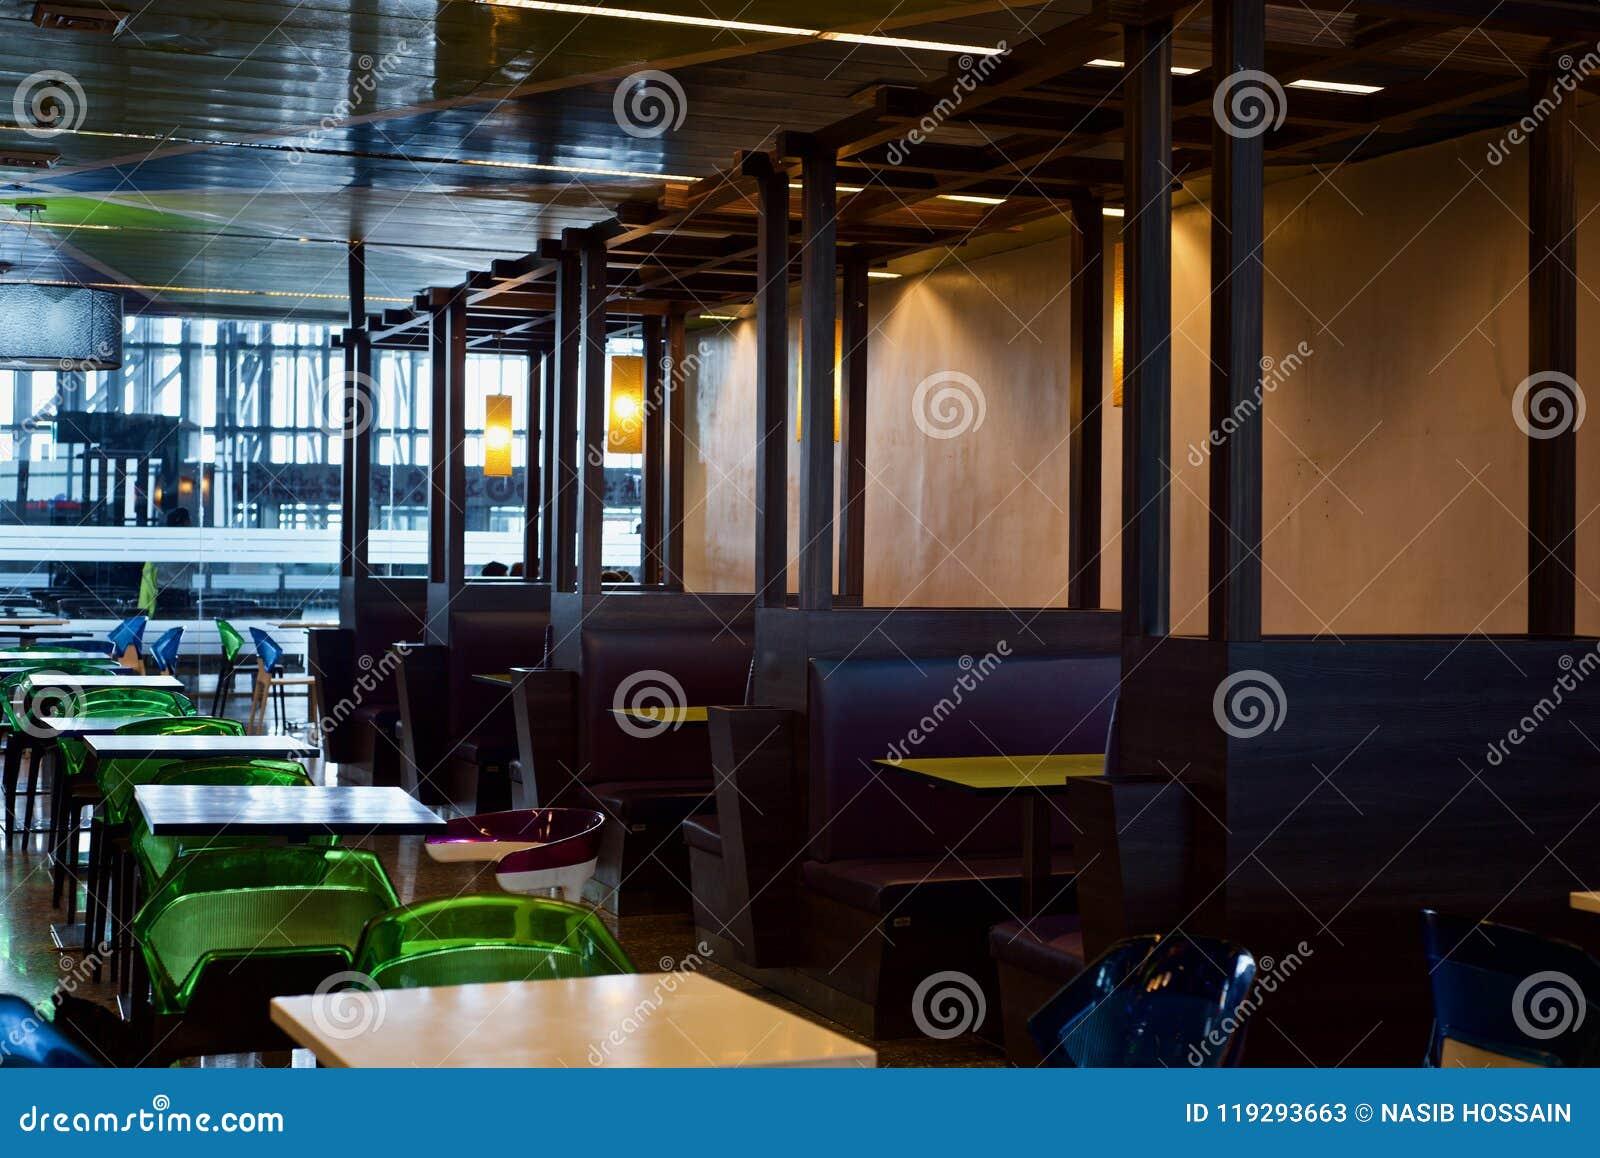 Download Beautiful Sitting Arrangements Of A Restaurant  Unique Photo Stock Image - Image of beautiful, restaurant: 119293663